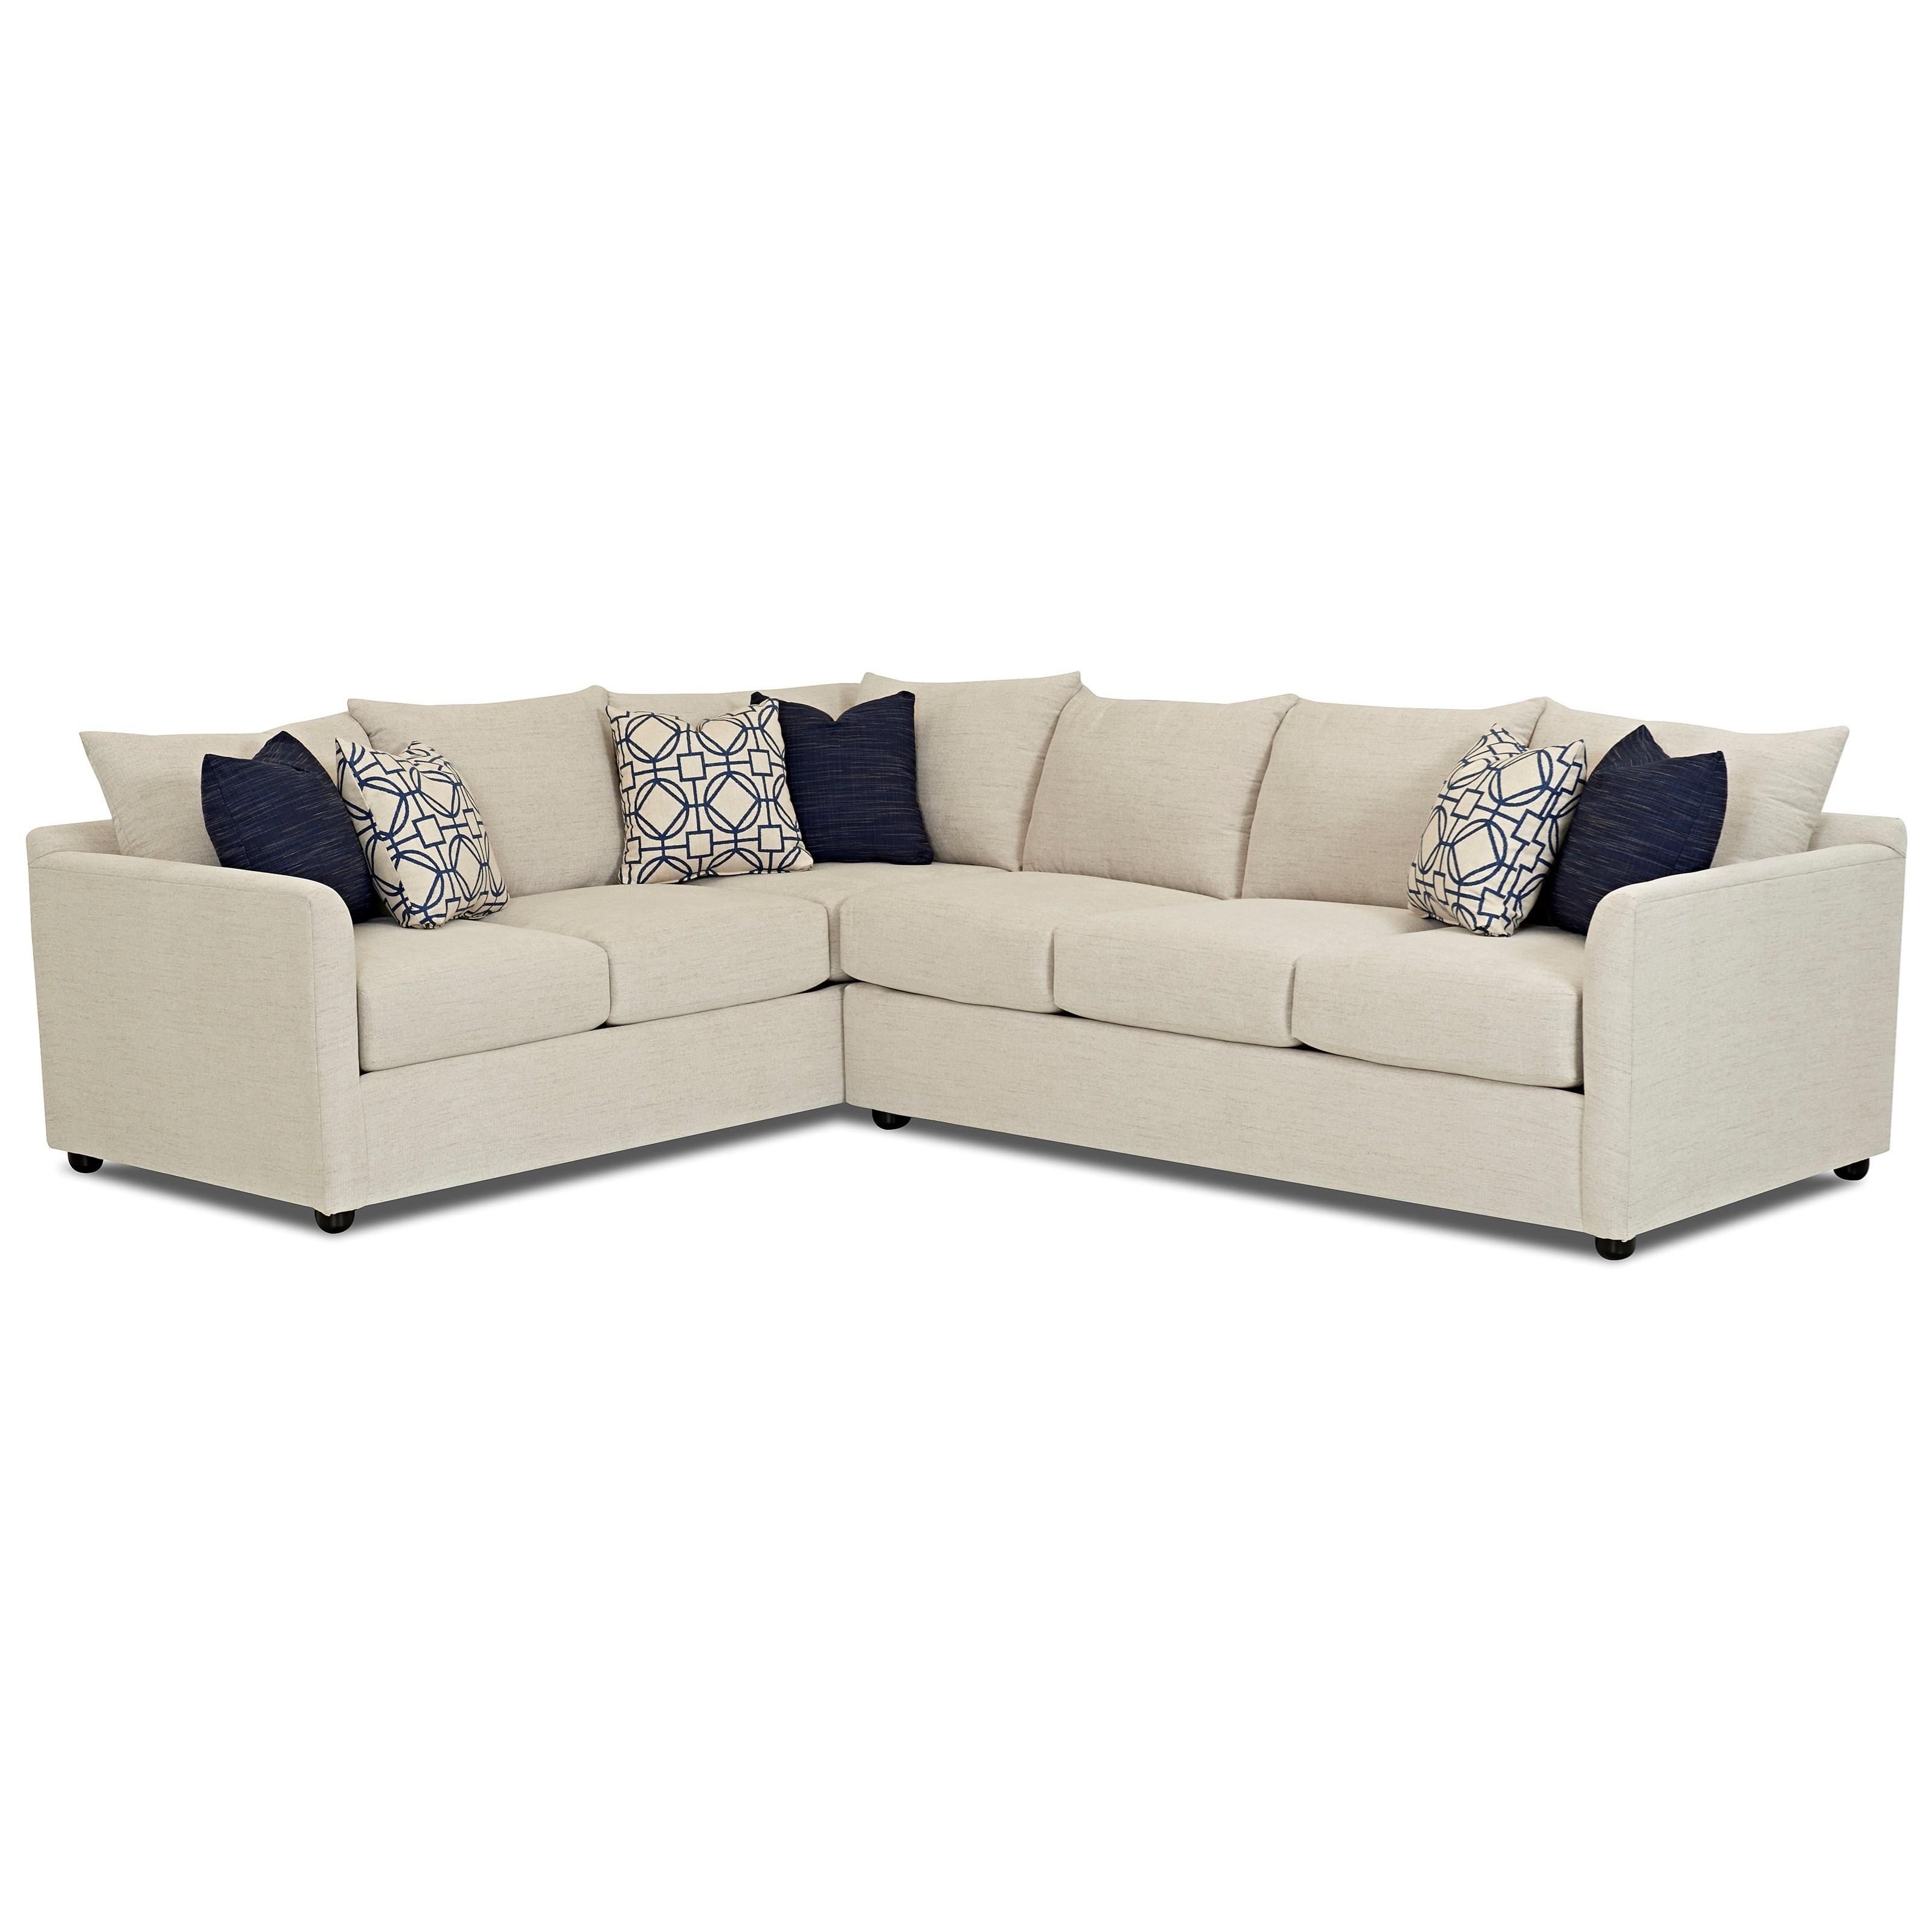 Charmant Trisha Yearwood Home AtlantaSectional Sofa ...